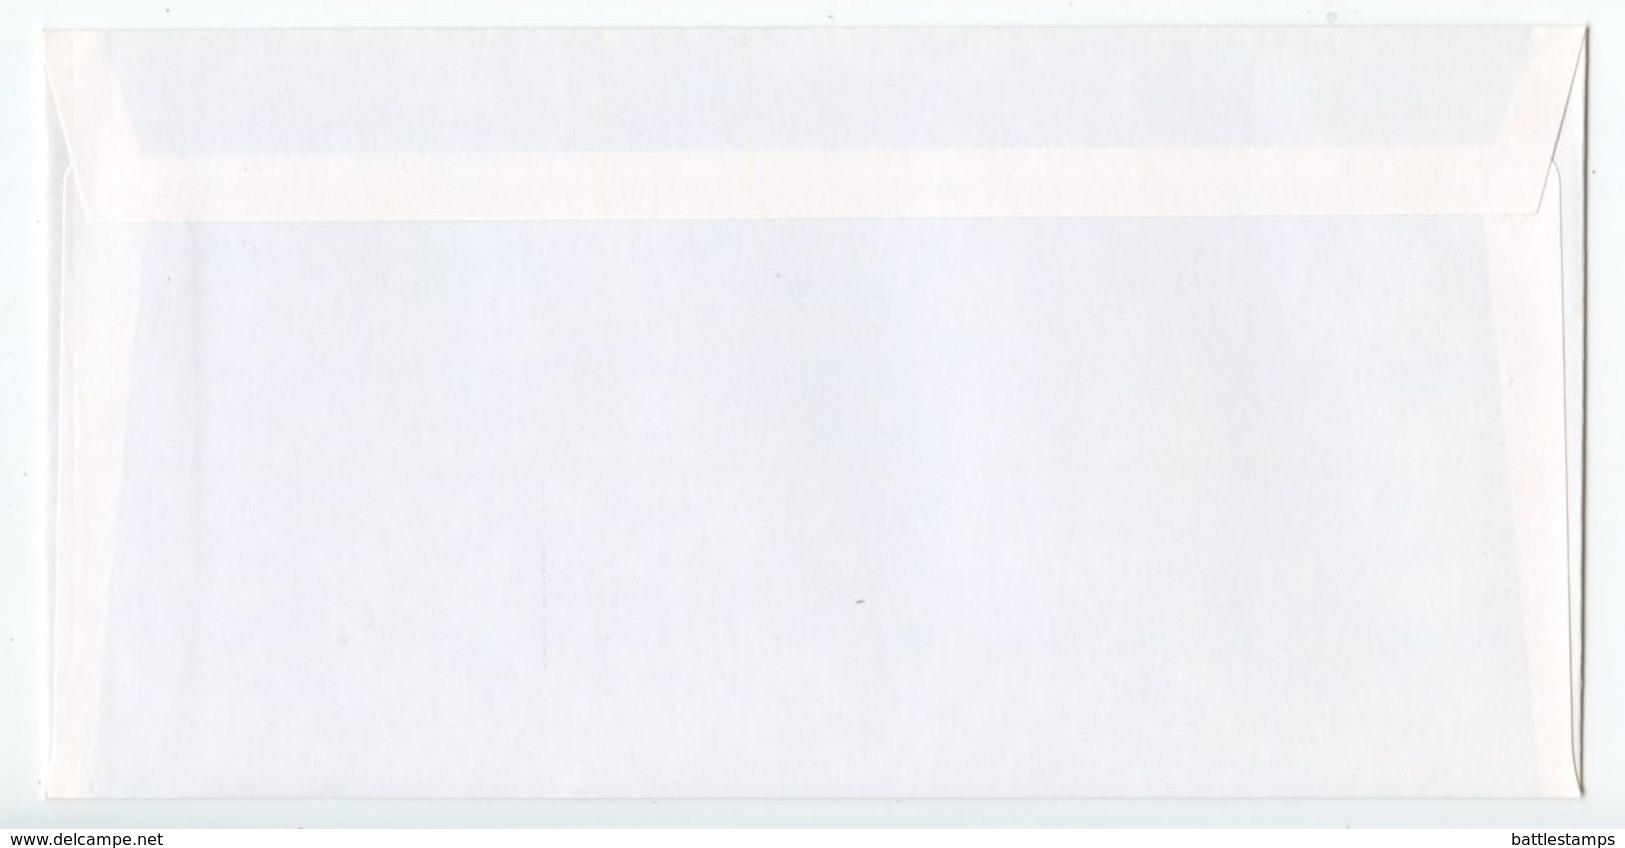 Belgium 1999 Mint Postal Envelope European Union Symbol & Brussels - Stamped Stationery